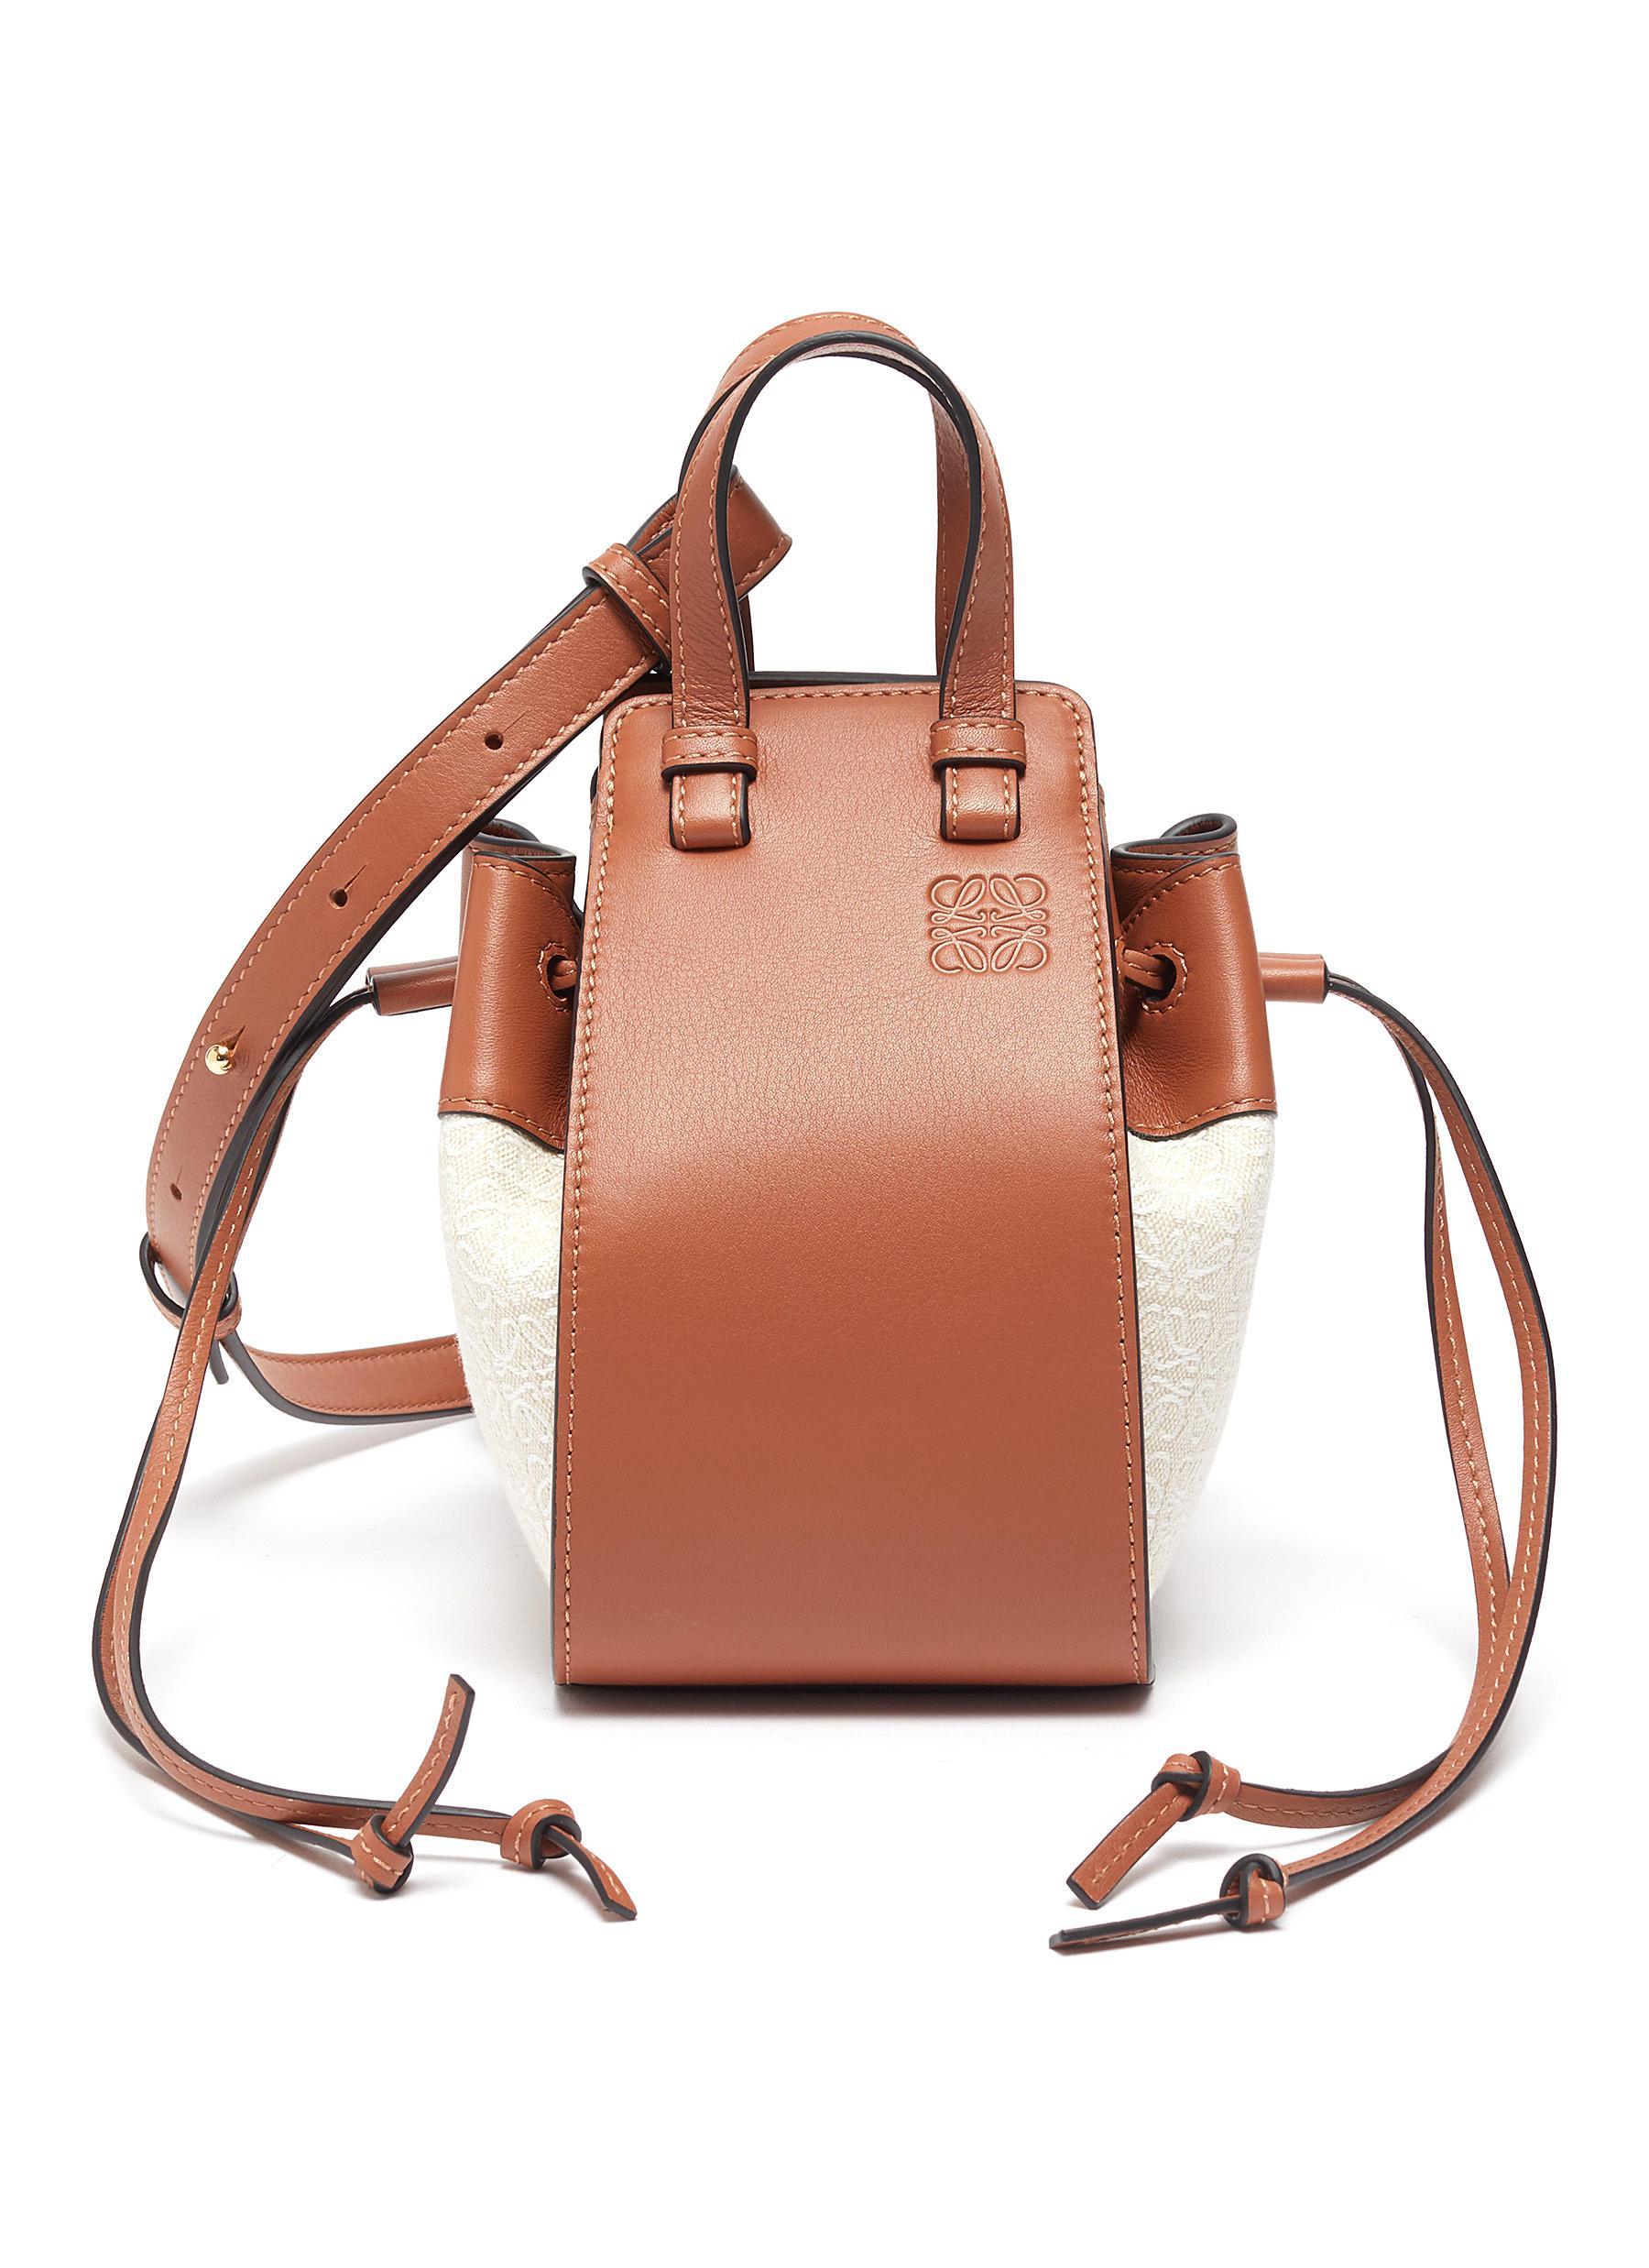 Hammock' Anagram Mini Bag